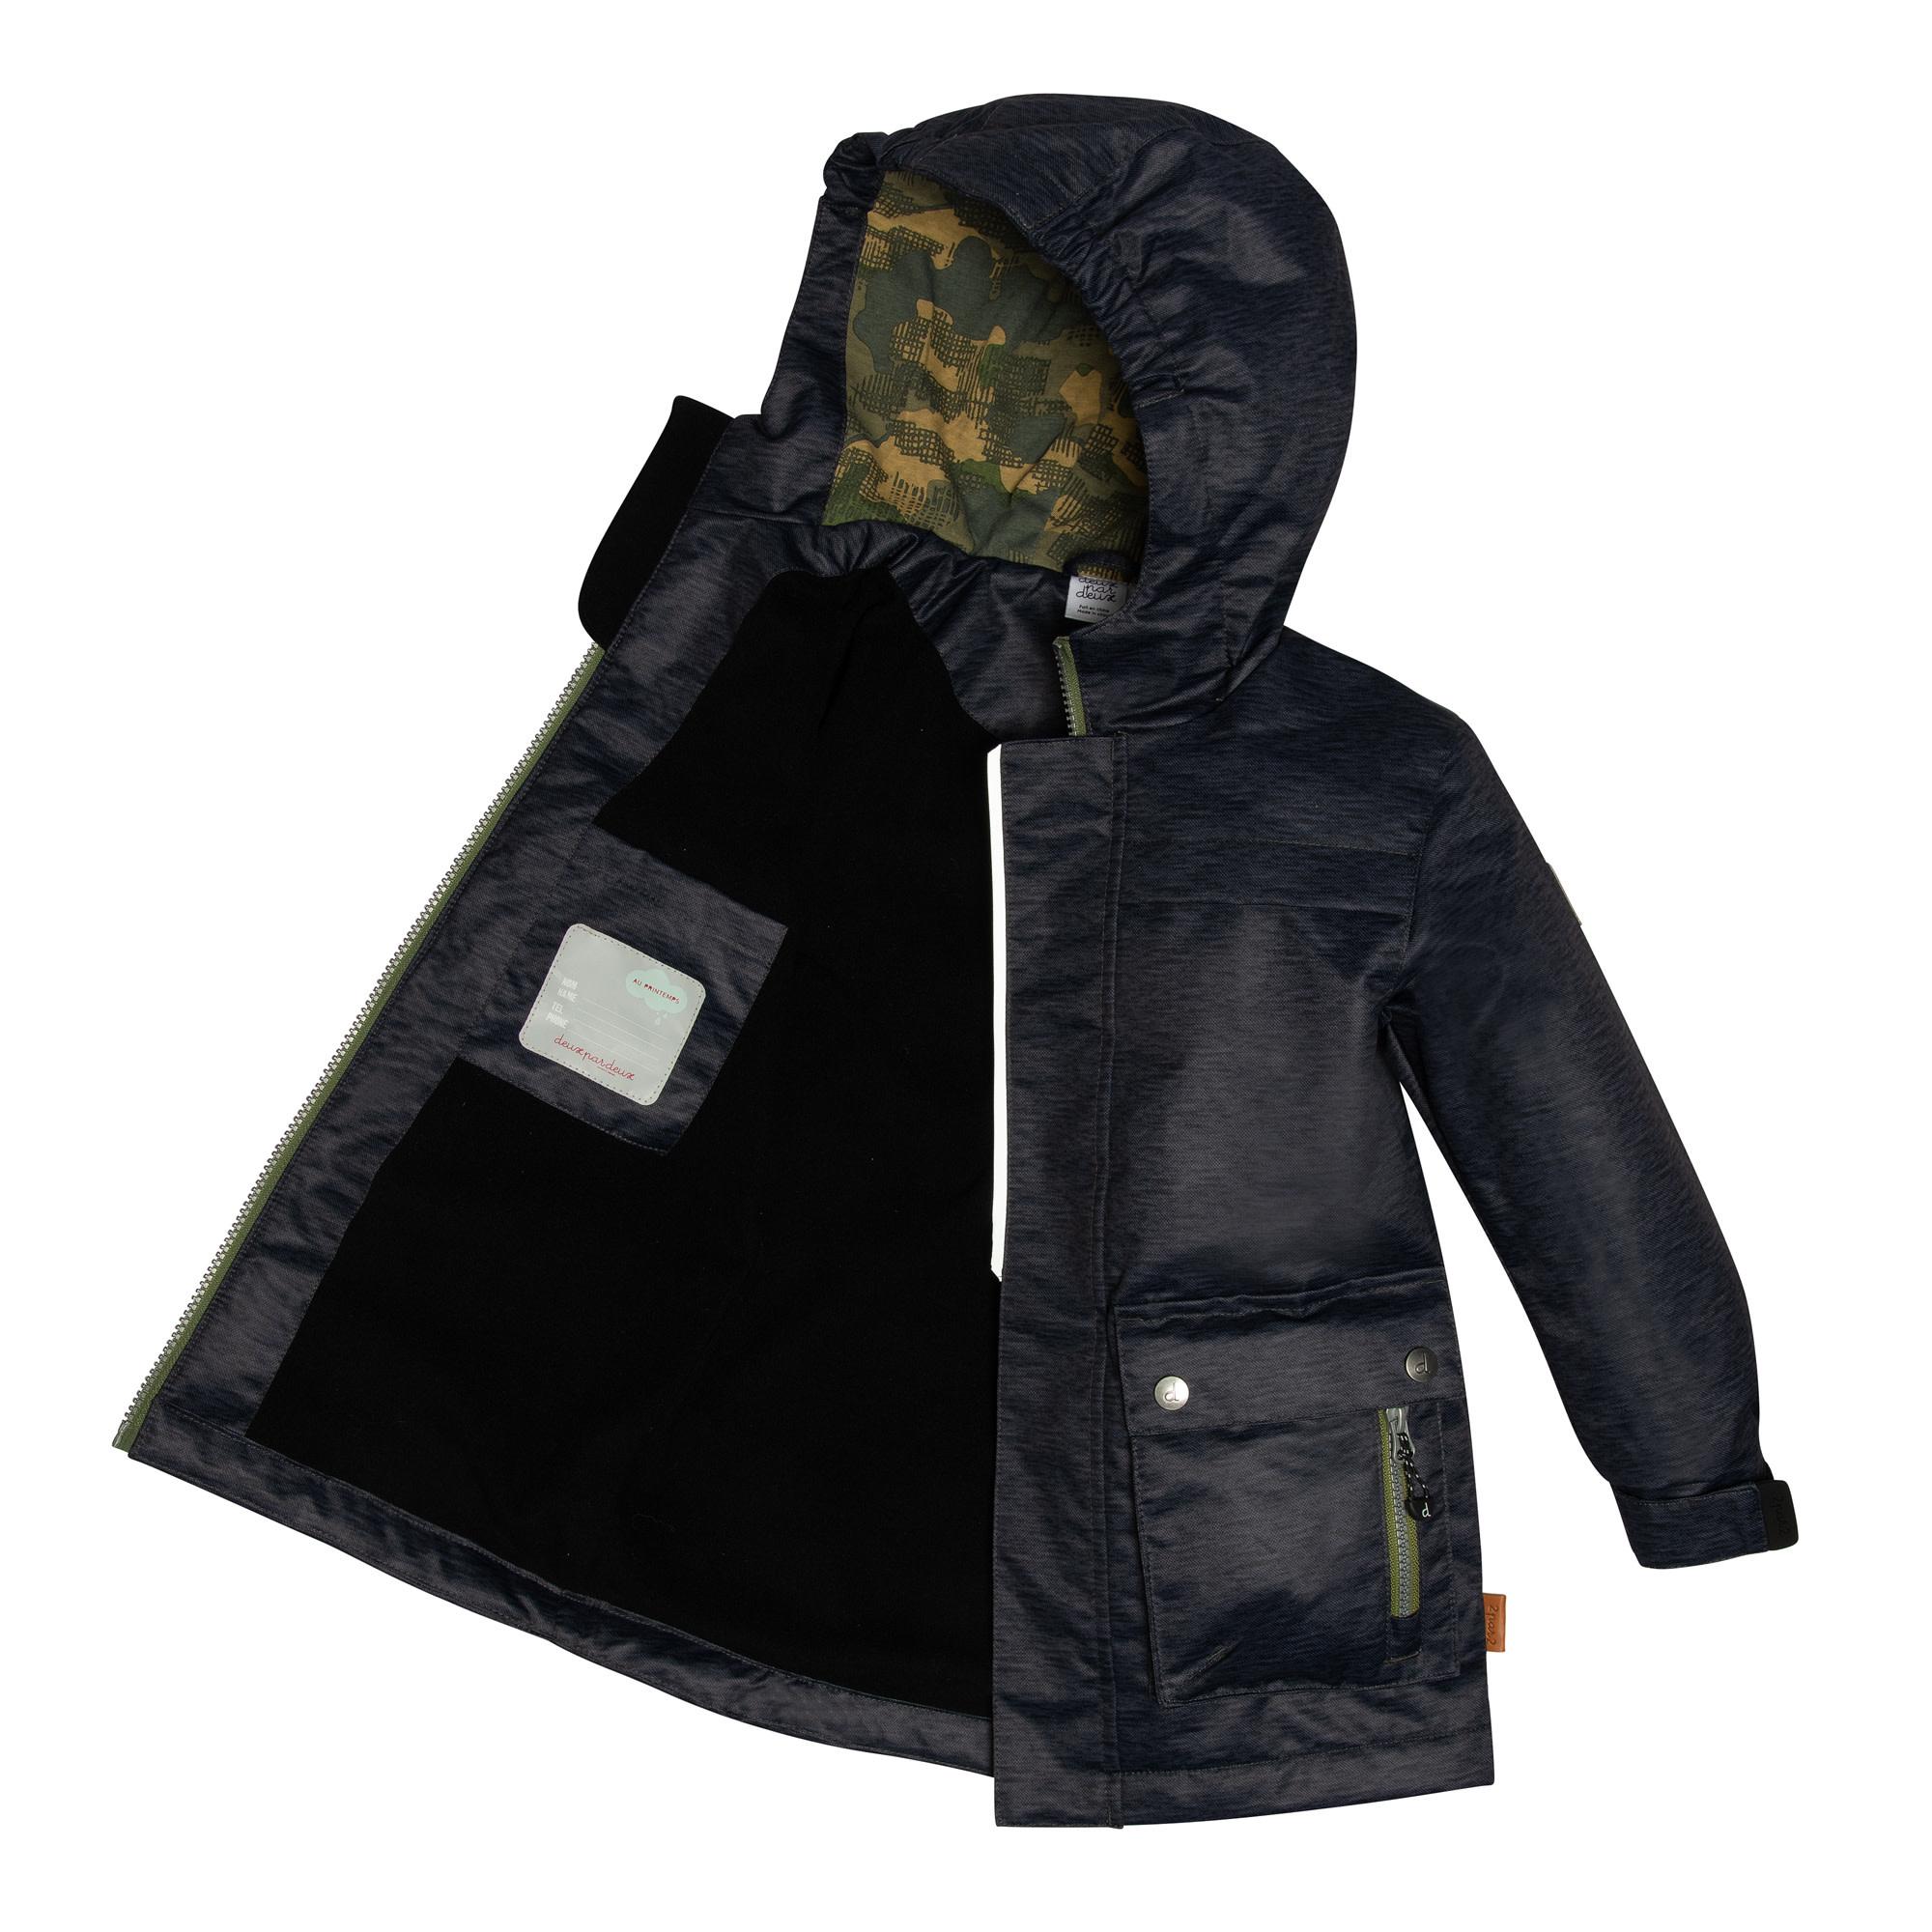 Manteau de pluie - Noir camo-3